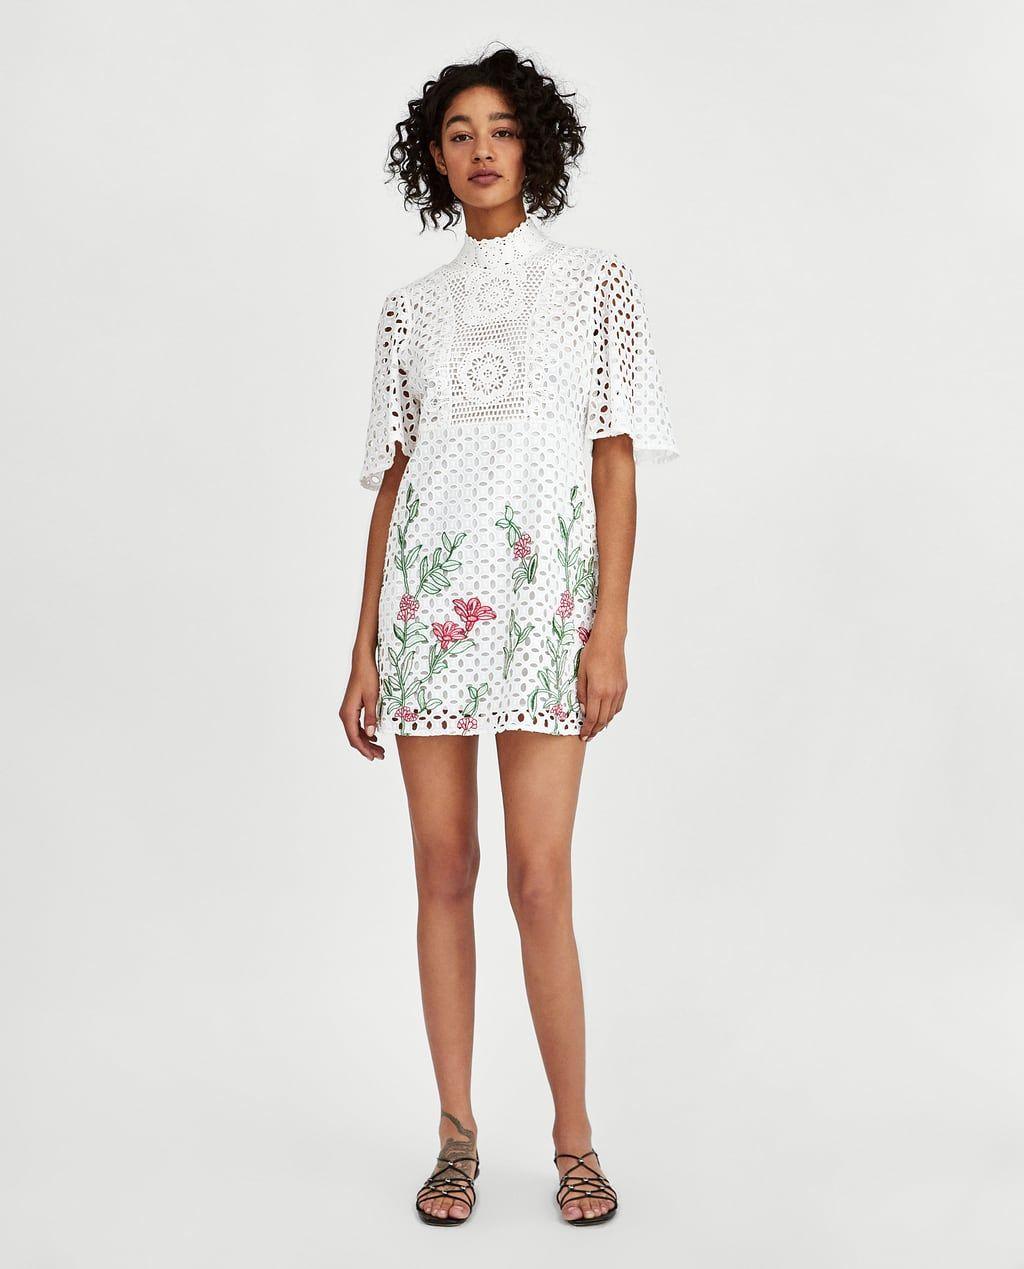 599365d8b1b82 ZARA - WOMAN - EMBROIDERED LACE DRESS Zara Shorts, Short En Jean, Zara  Dresses